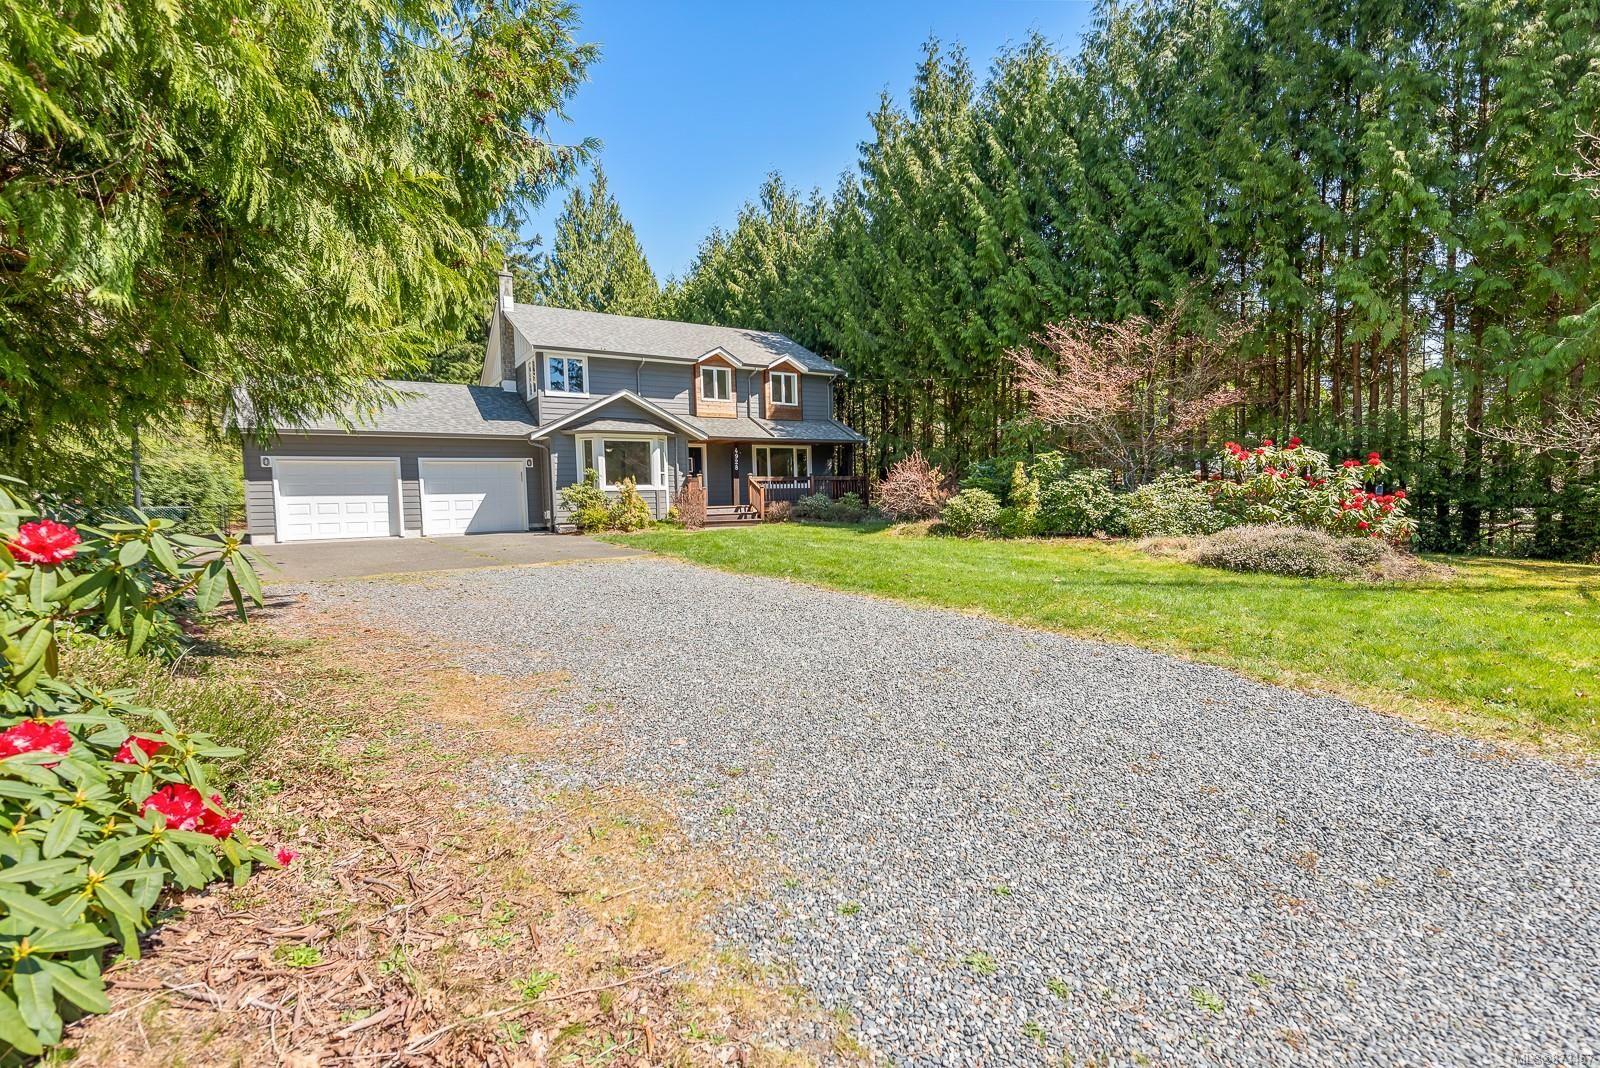 Main Photo: 4928 Willis Way in : CV Courtenay North House for sale (Comox Valley)  : MLS®# 873457